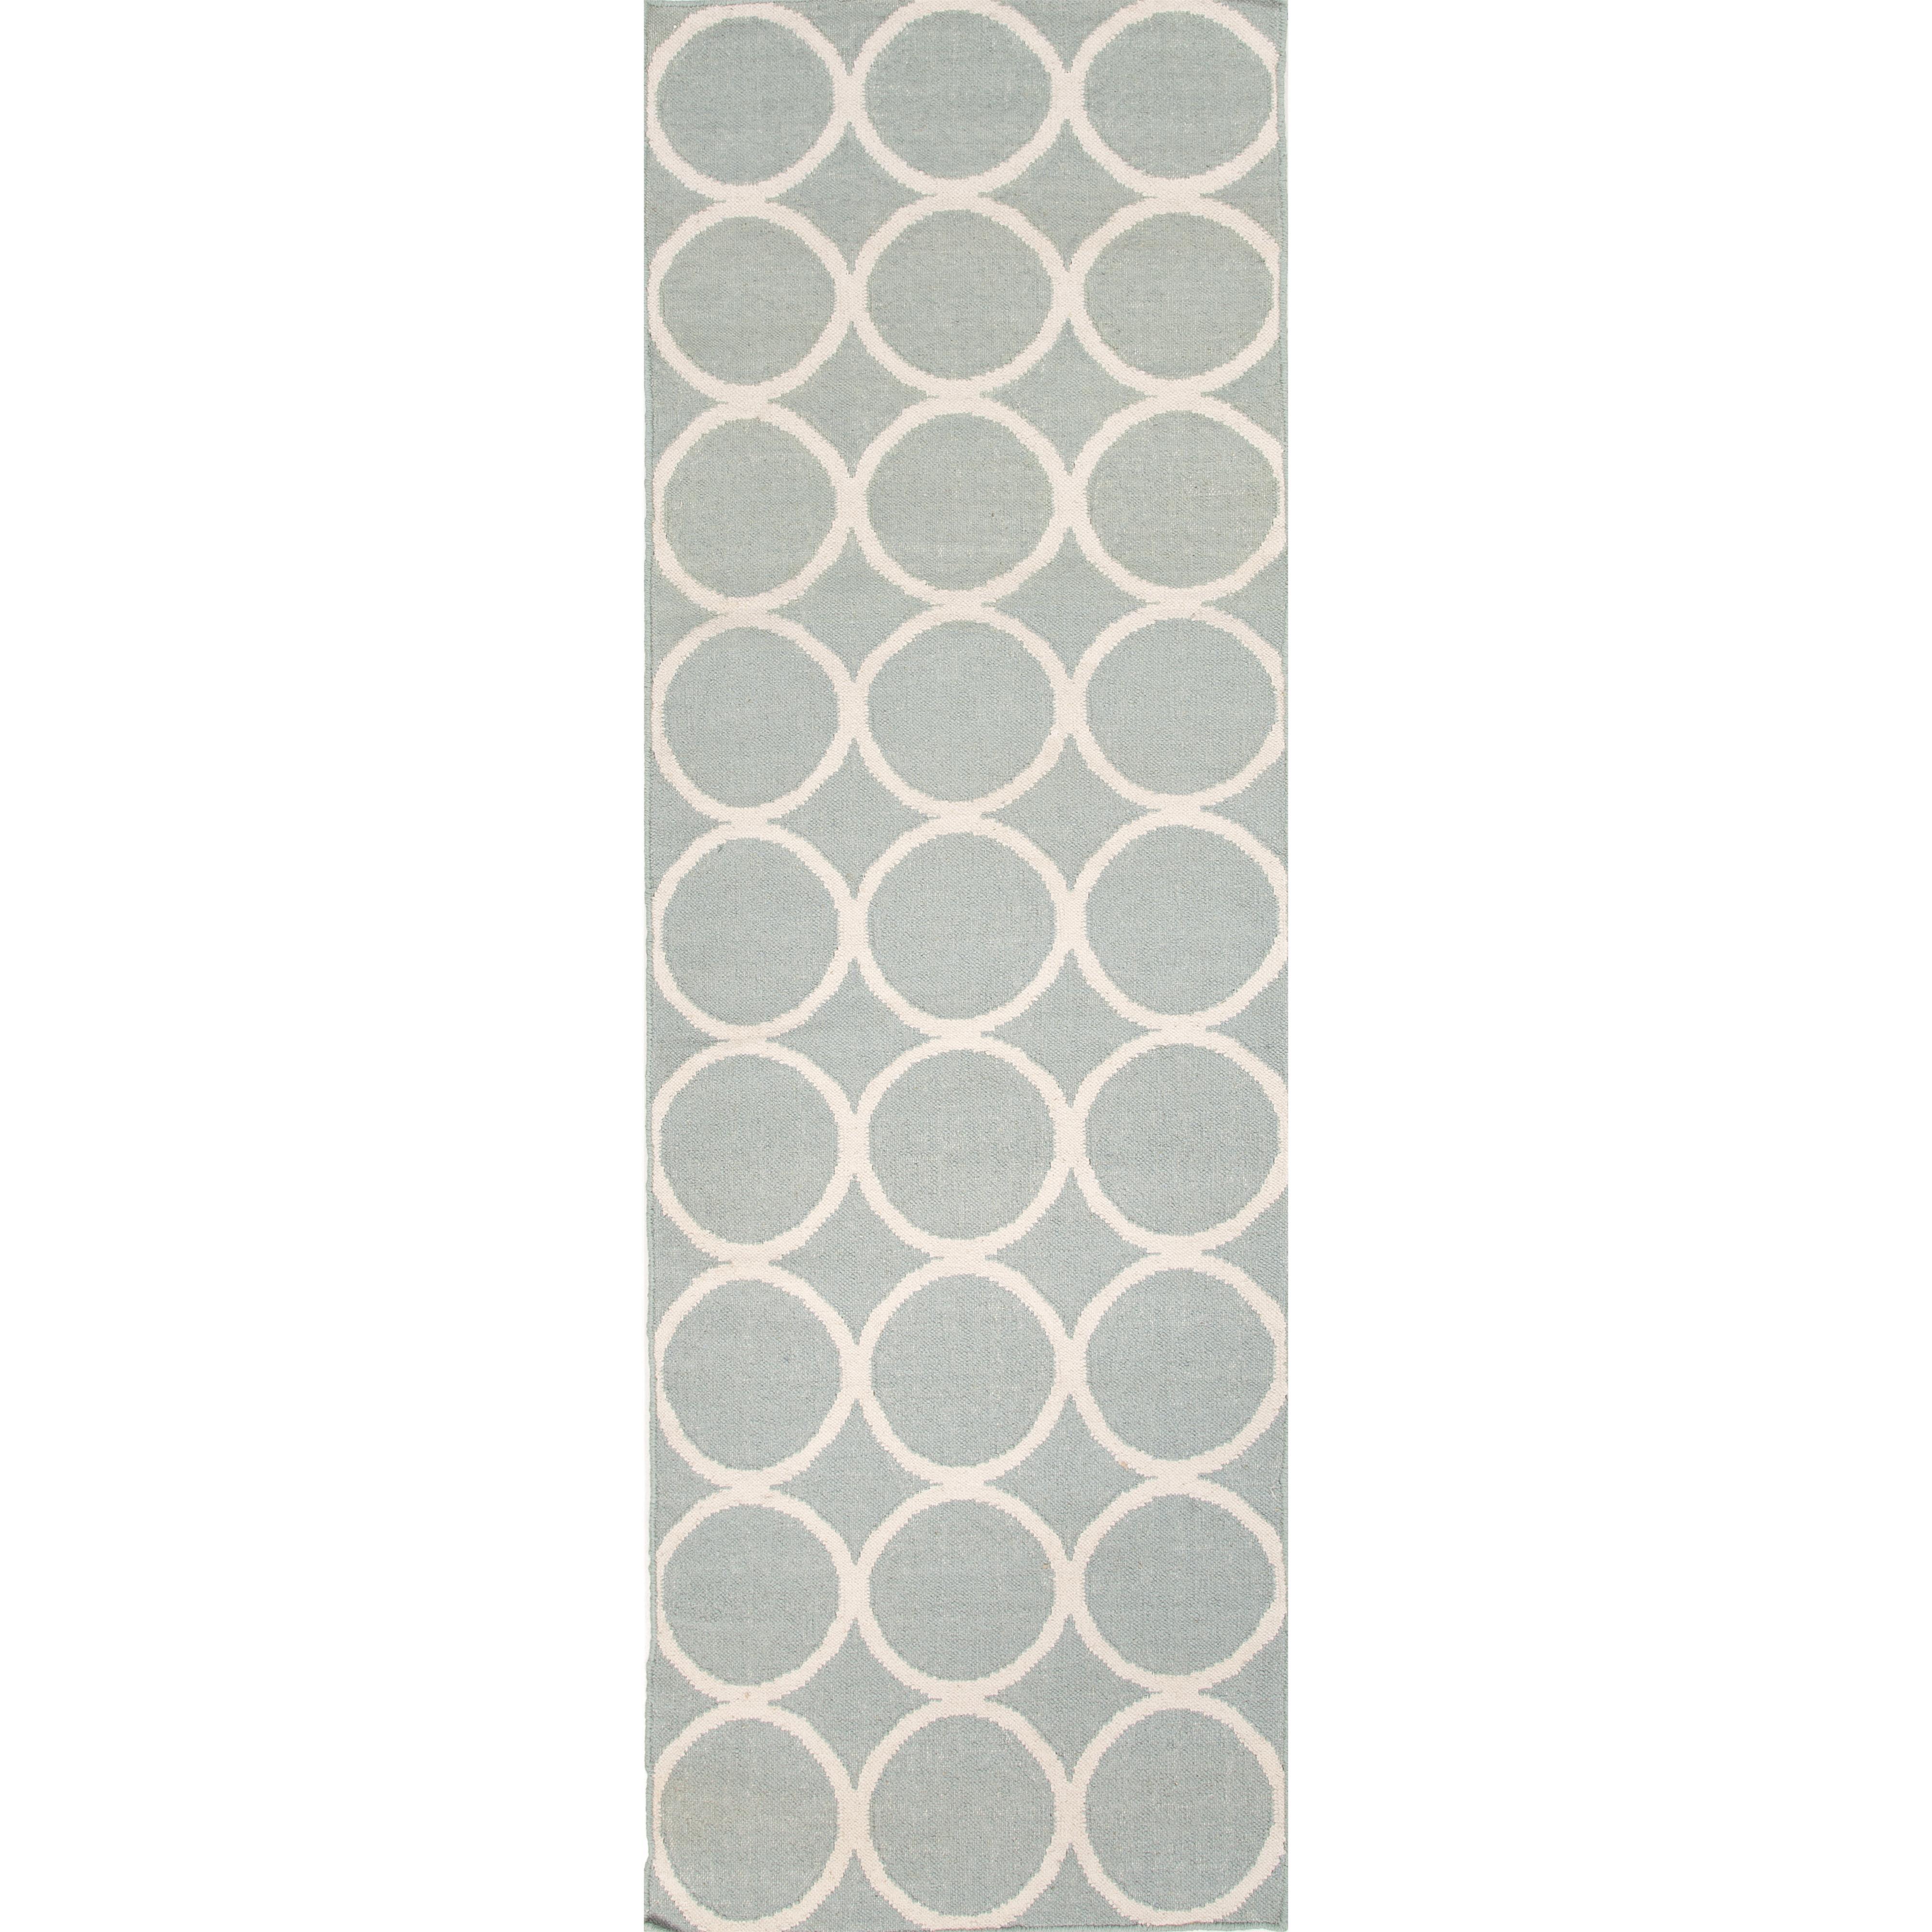 JAIPUR Rugs Maroc 2.6 x 8 Rug - Item Number: RUG102533